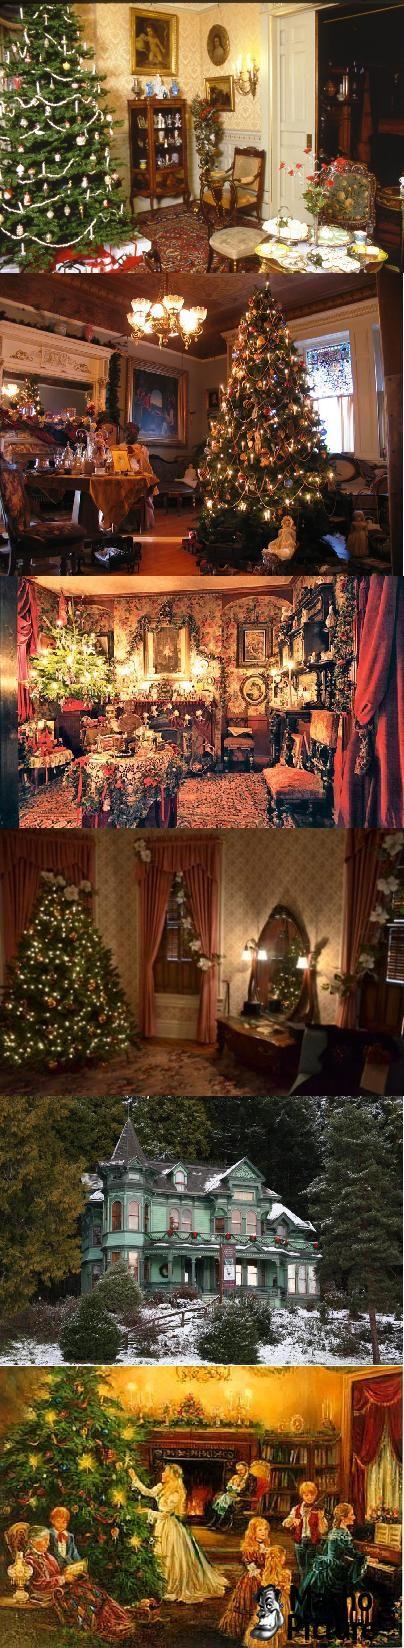 Victorian christmas house - 7 PHOTO!